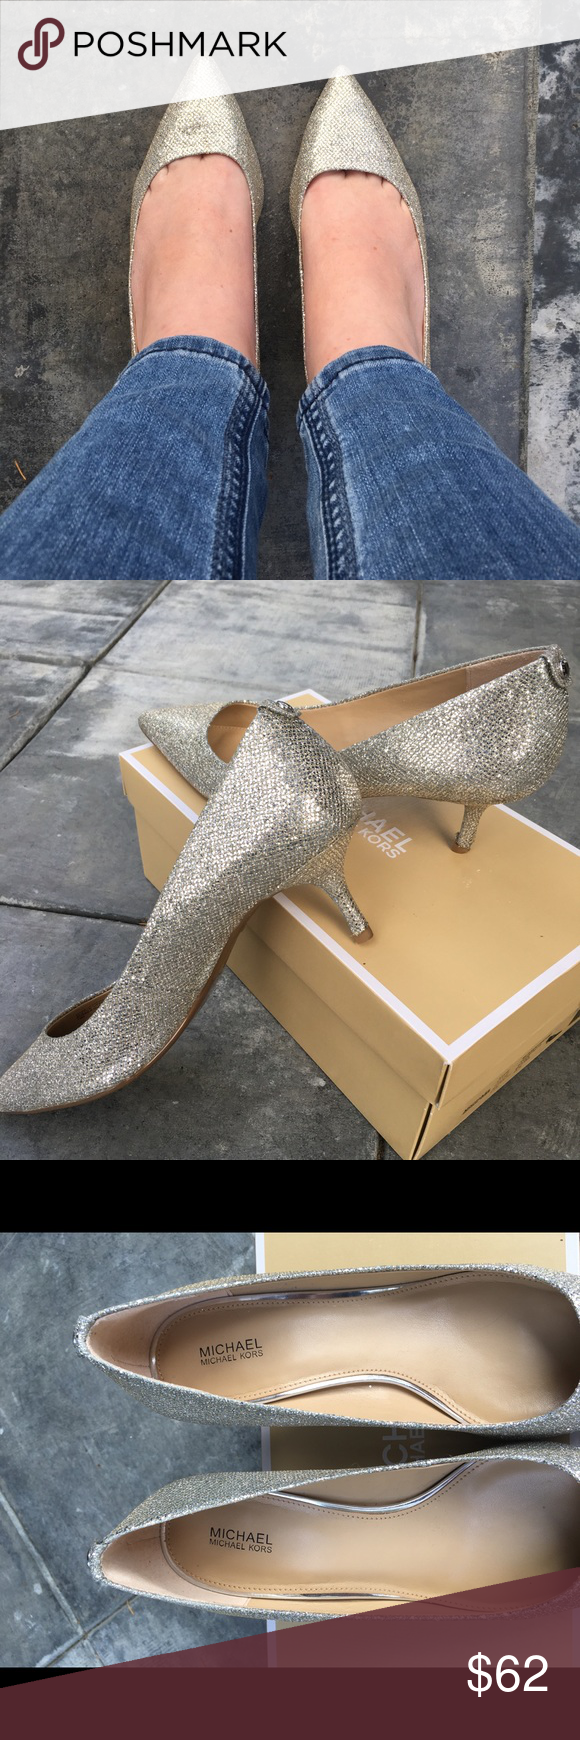 Michael Kors Flex Kitten Pump In Silver Glitter Michael Kors Shoes Heels